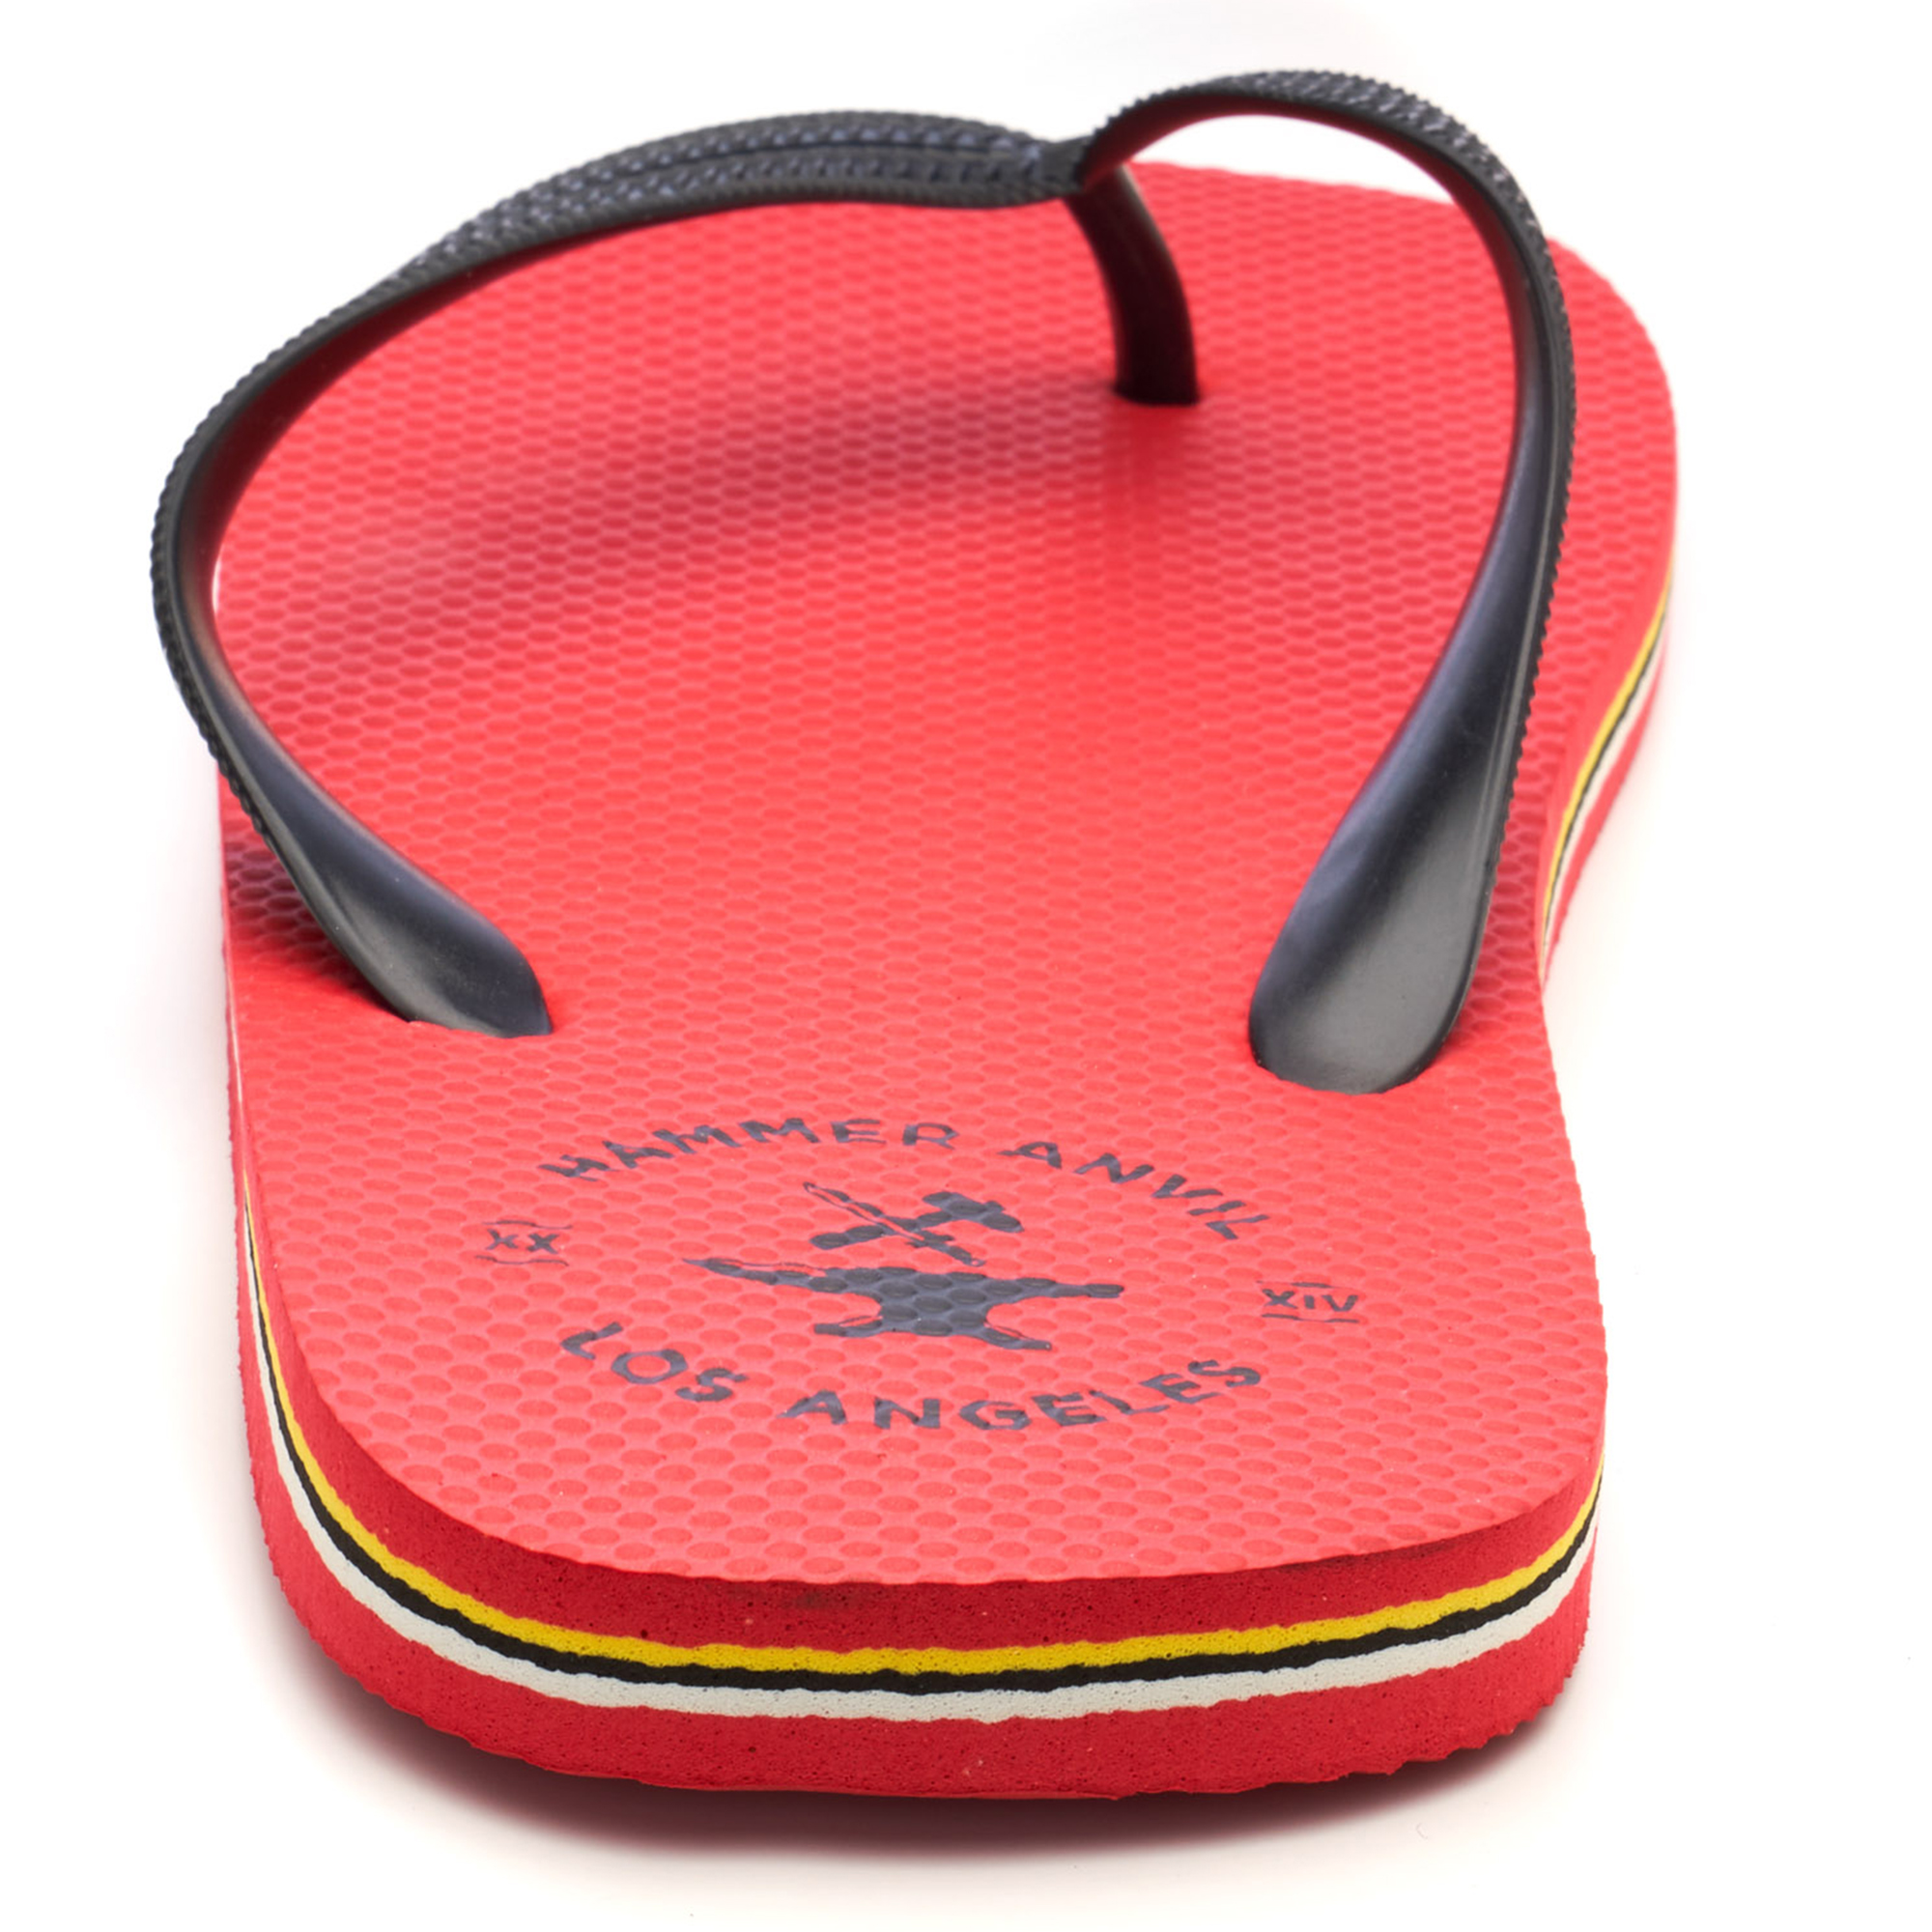 Hammer-Anvil-Mens-Flip-Flops-Casual-Thong-Summer-Sandals-Comfortable-Beach-Shoes thumbnail 44